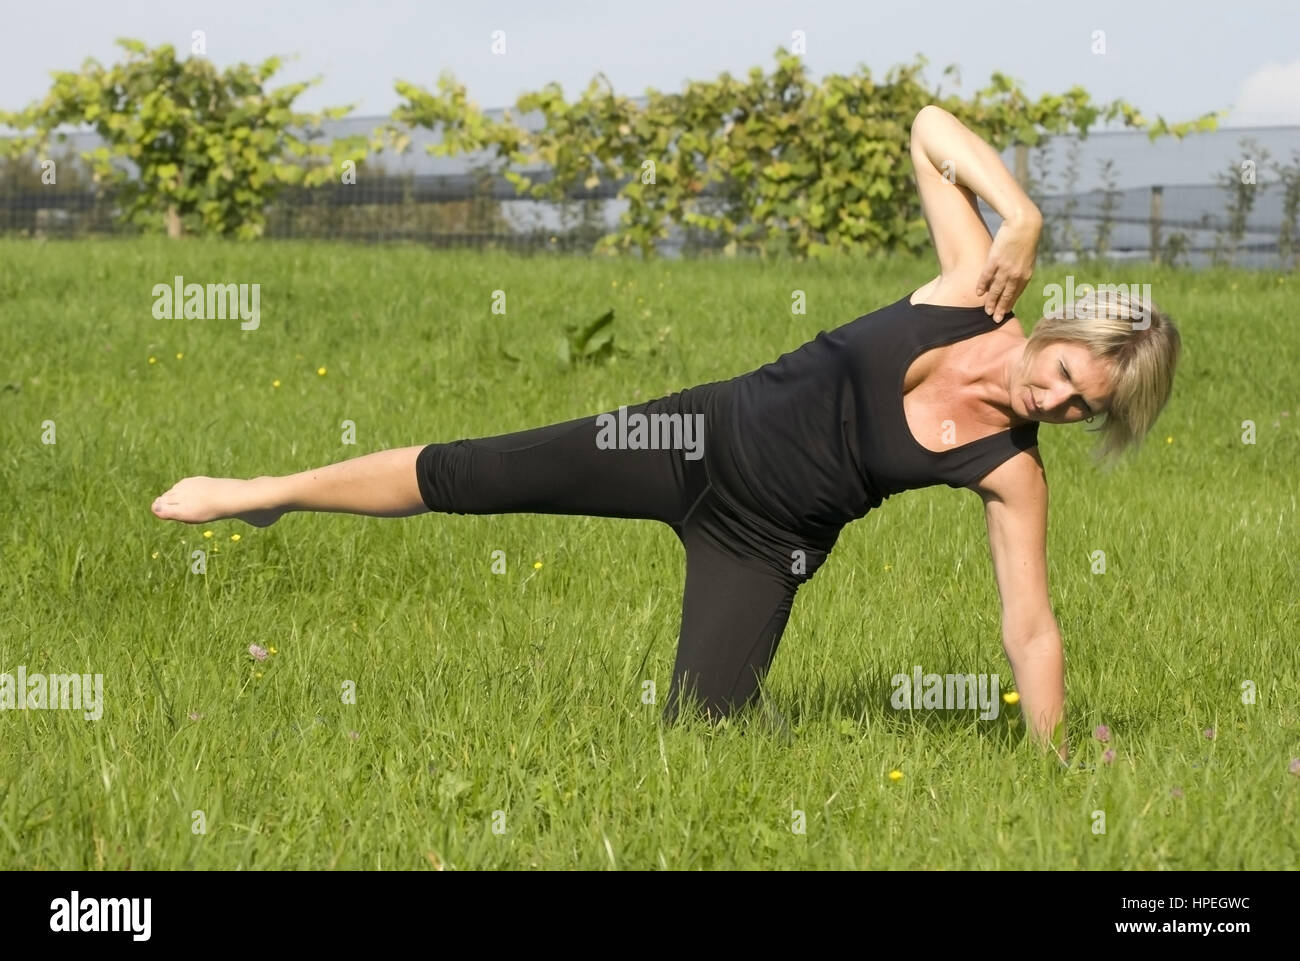 Frau macht Pilates in der Wiese - woman does pilates in meadow - Stock Image